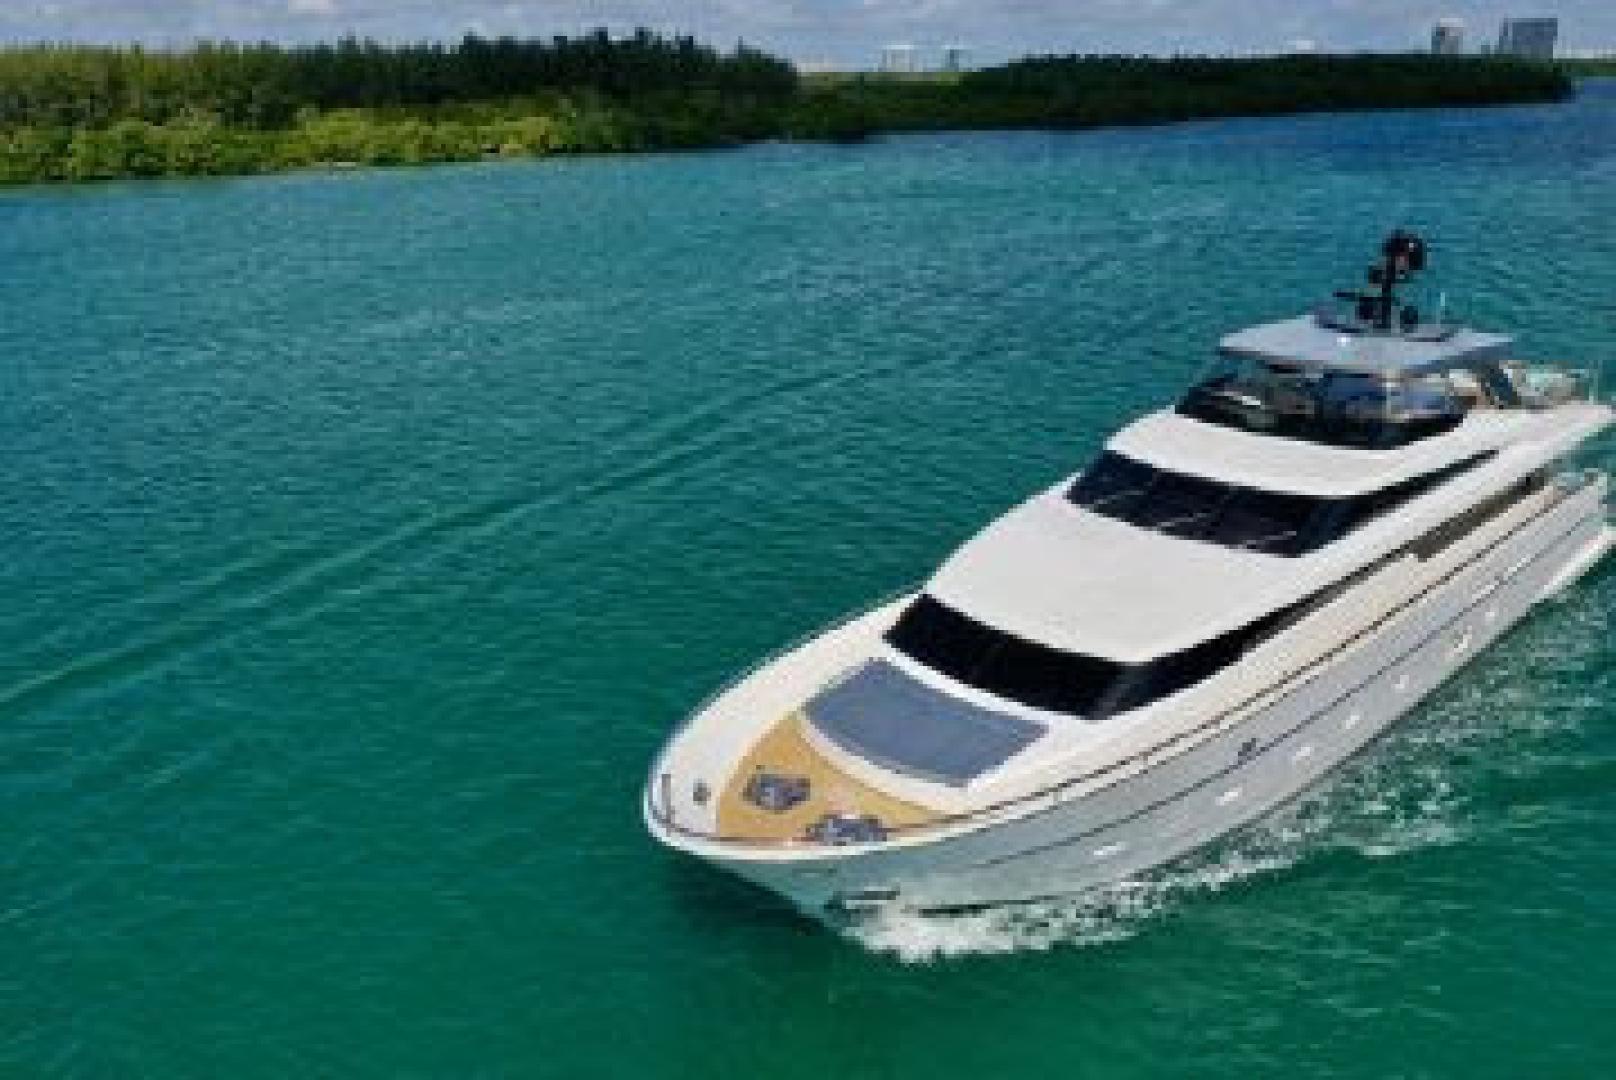 Sanlorenzo-SL94 2012-Sanlorenzo SL94 Aventura-Florida-United States-1637111 | Thumbnail